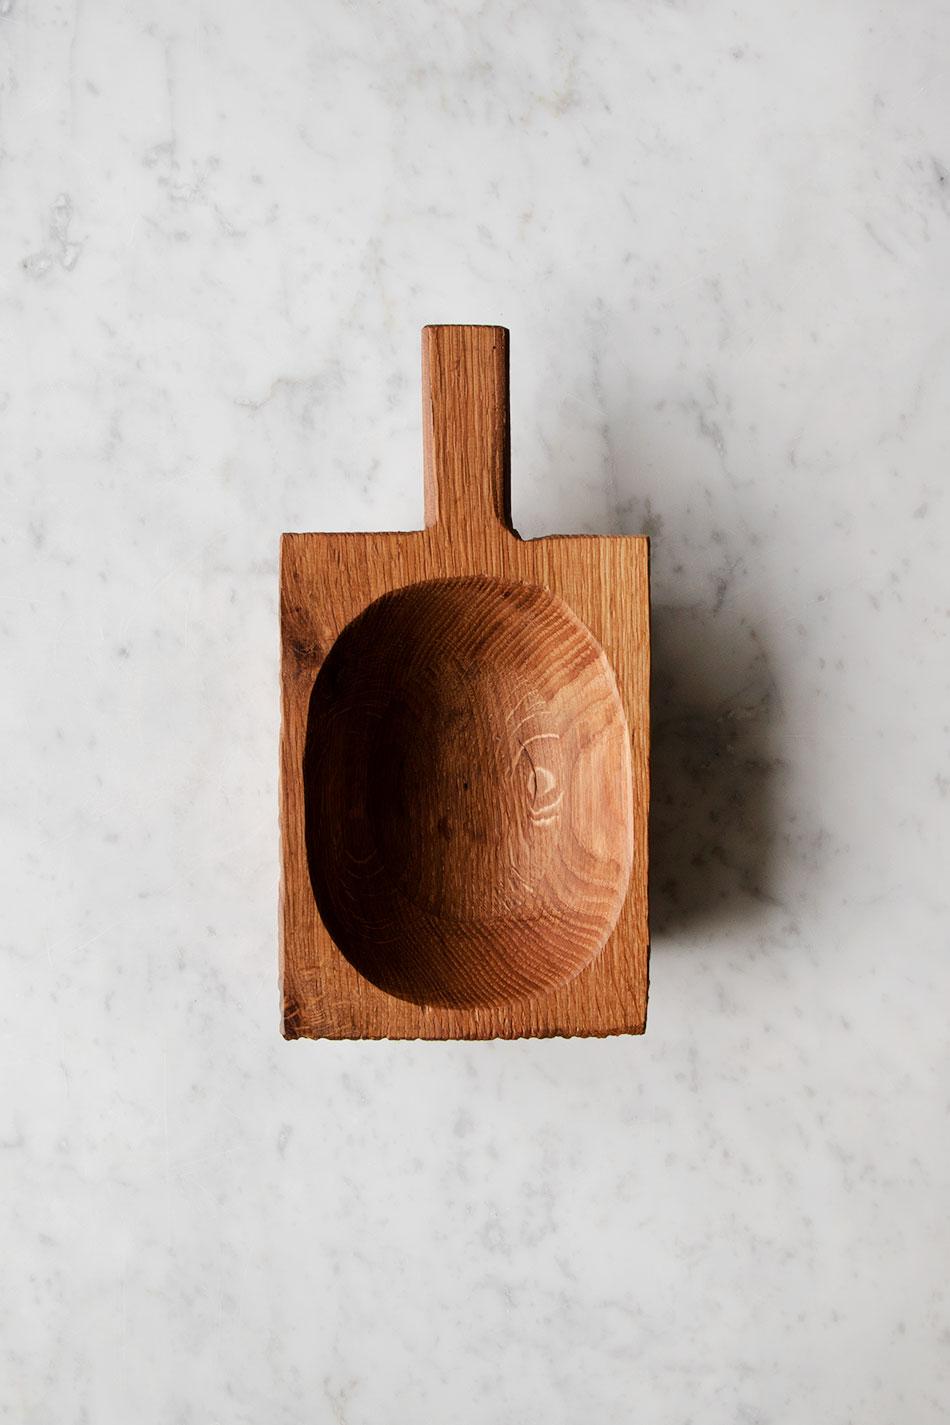 Artisan Dish WIth Handle